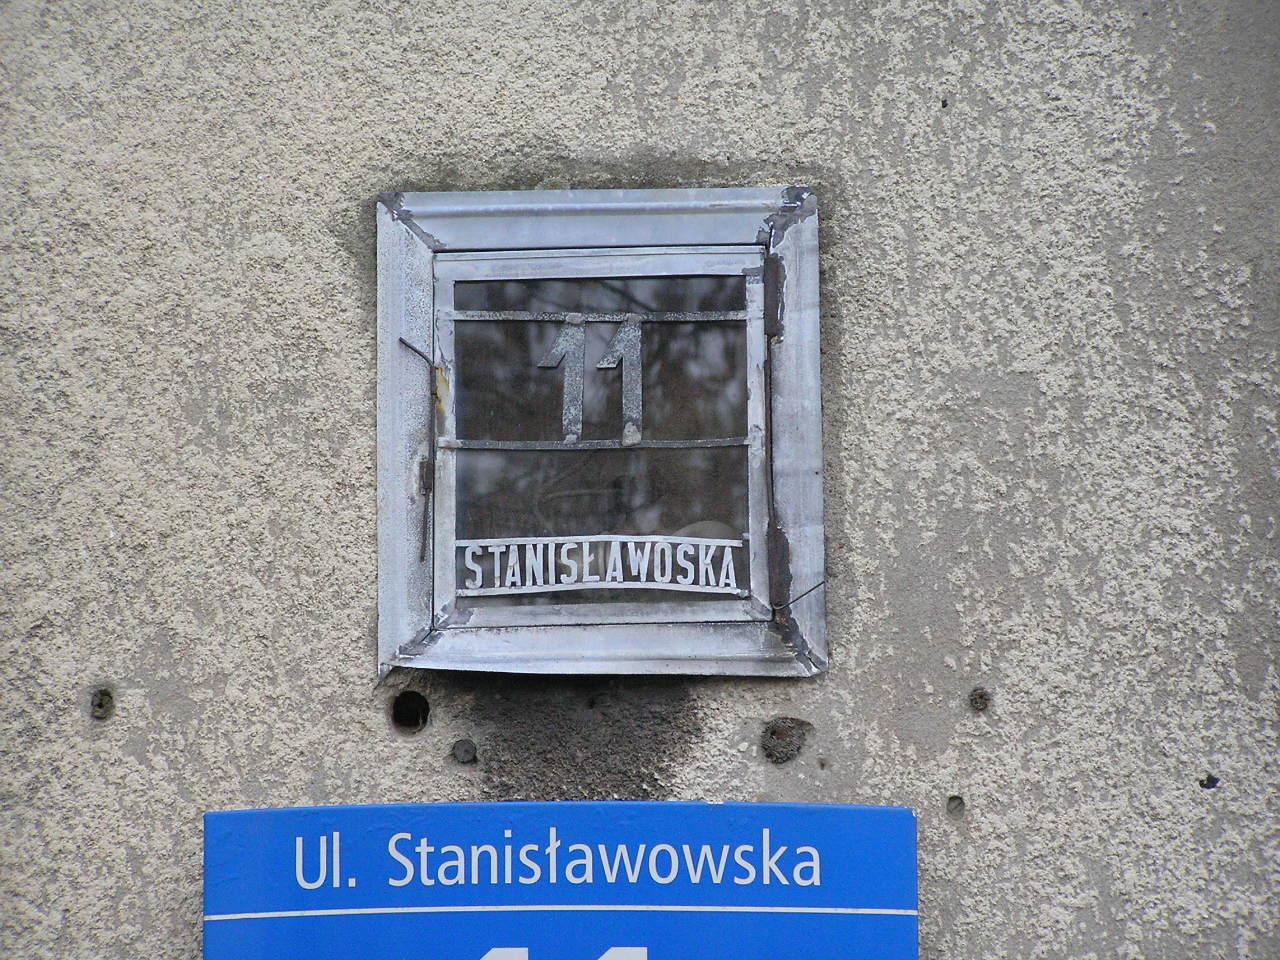 Latarenka adresowa - Stanisławowska 11